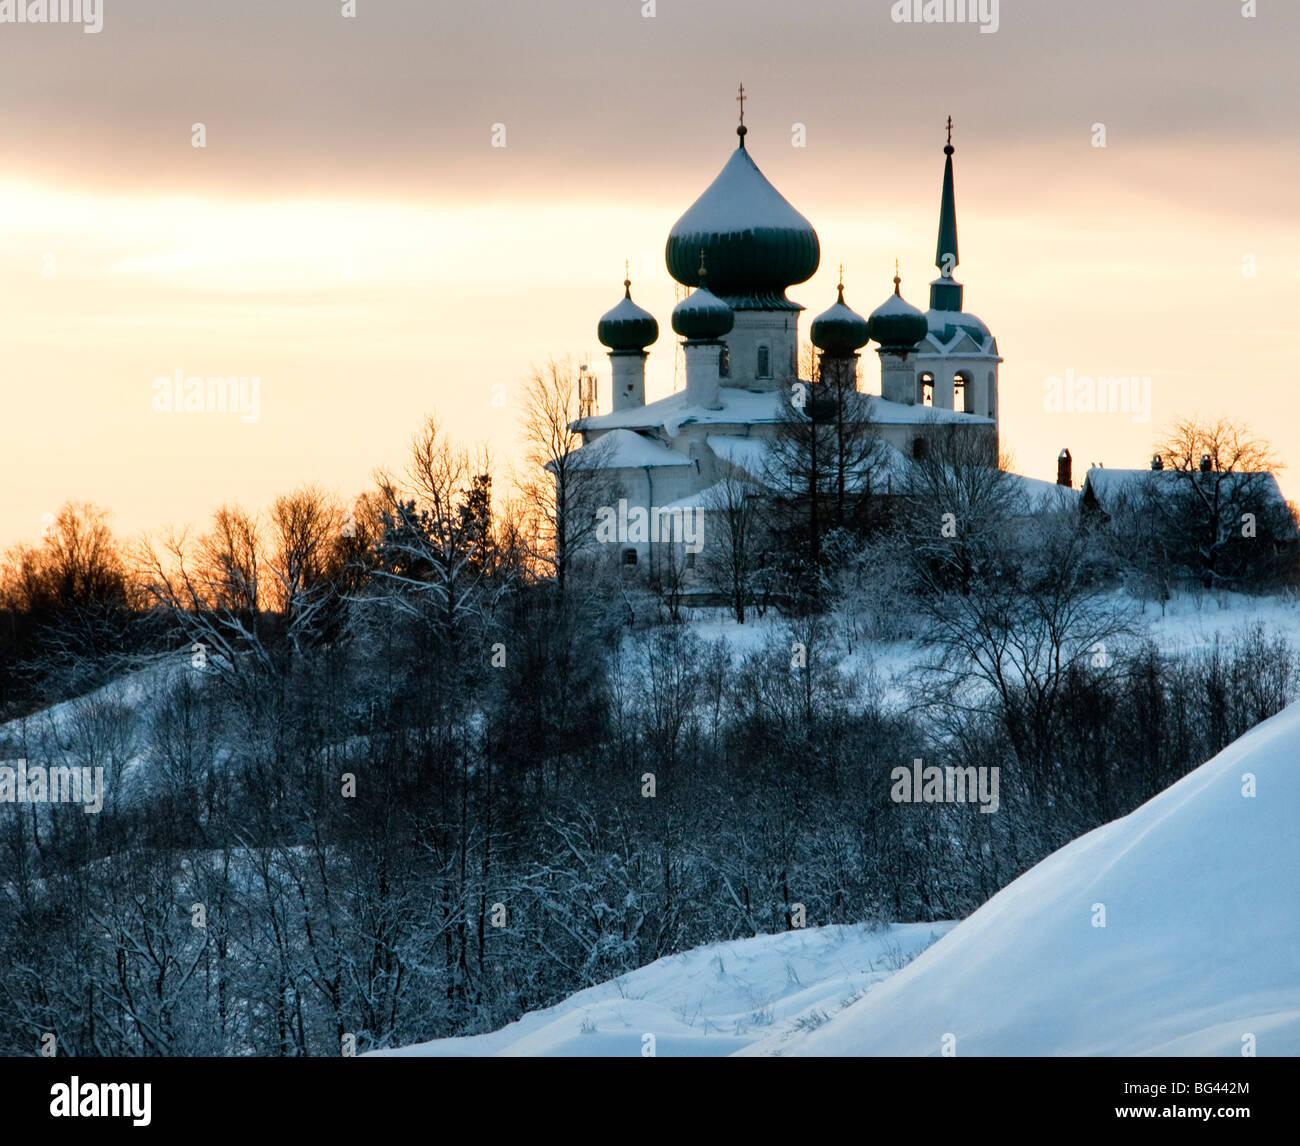 Church of Saint John the Baptist at dusk, Staraya Ladoga, Leningrad region, Russia - Stock Image